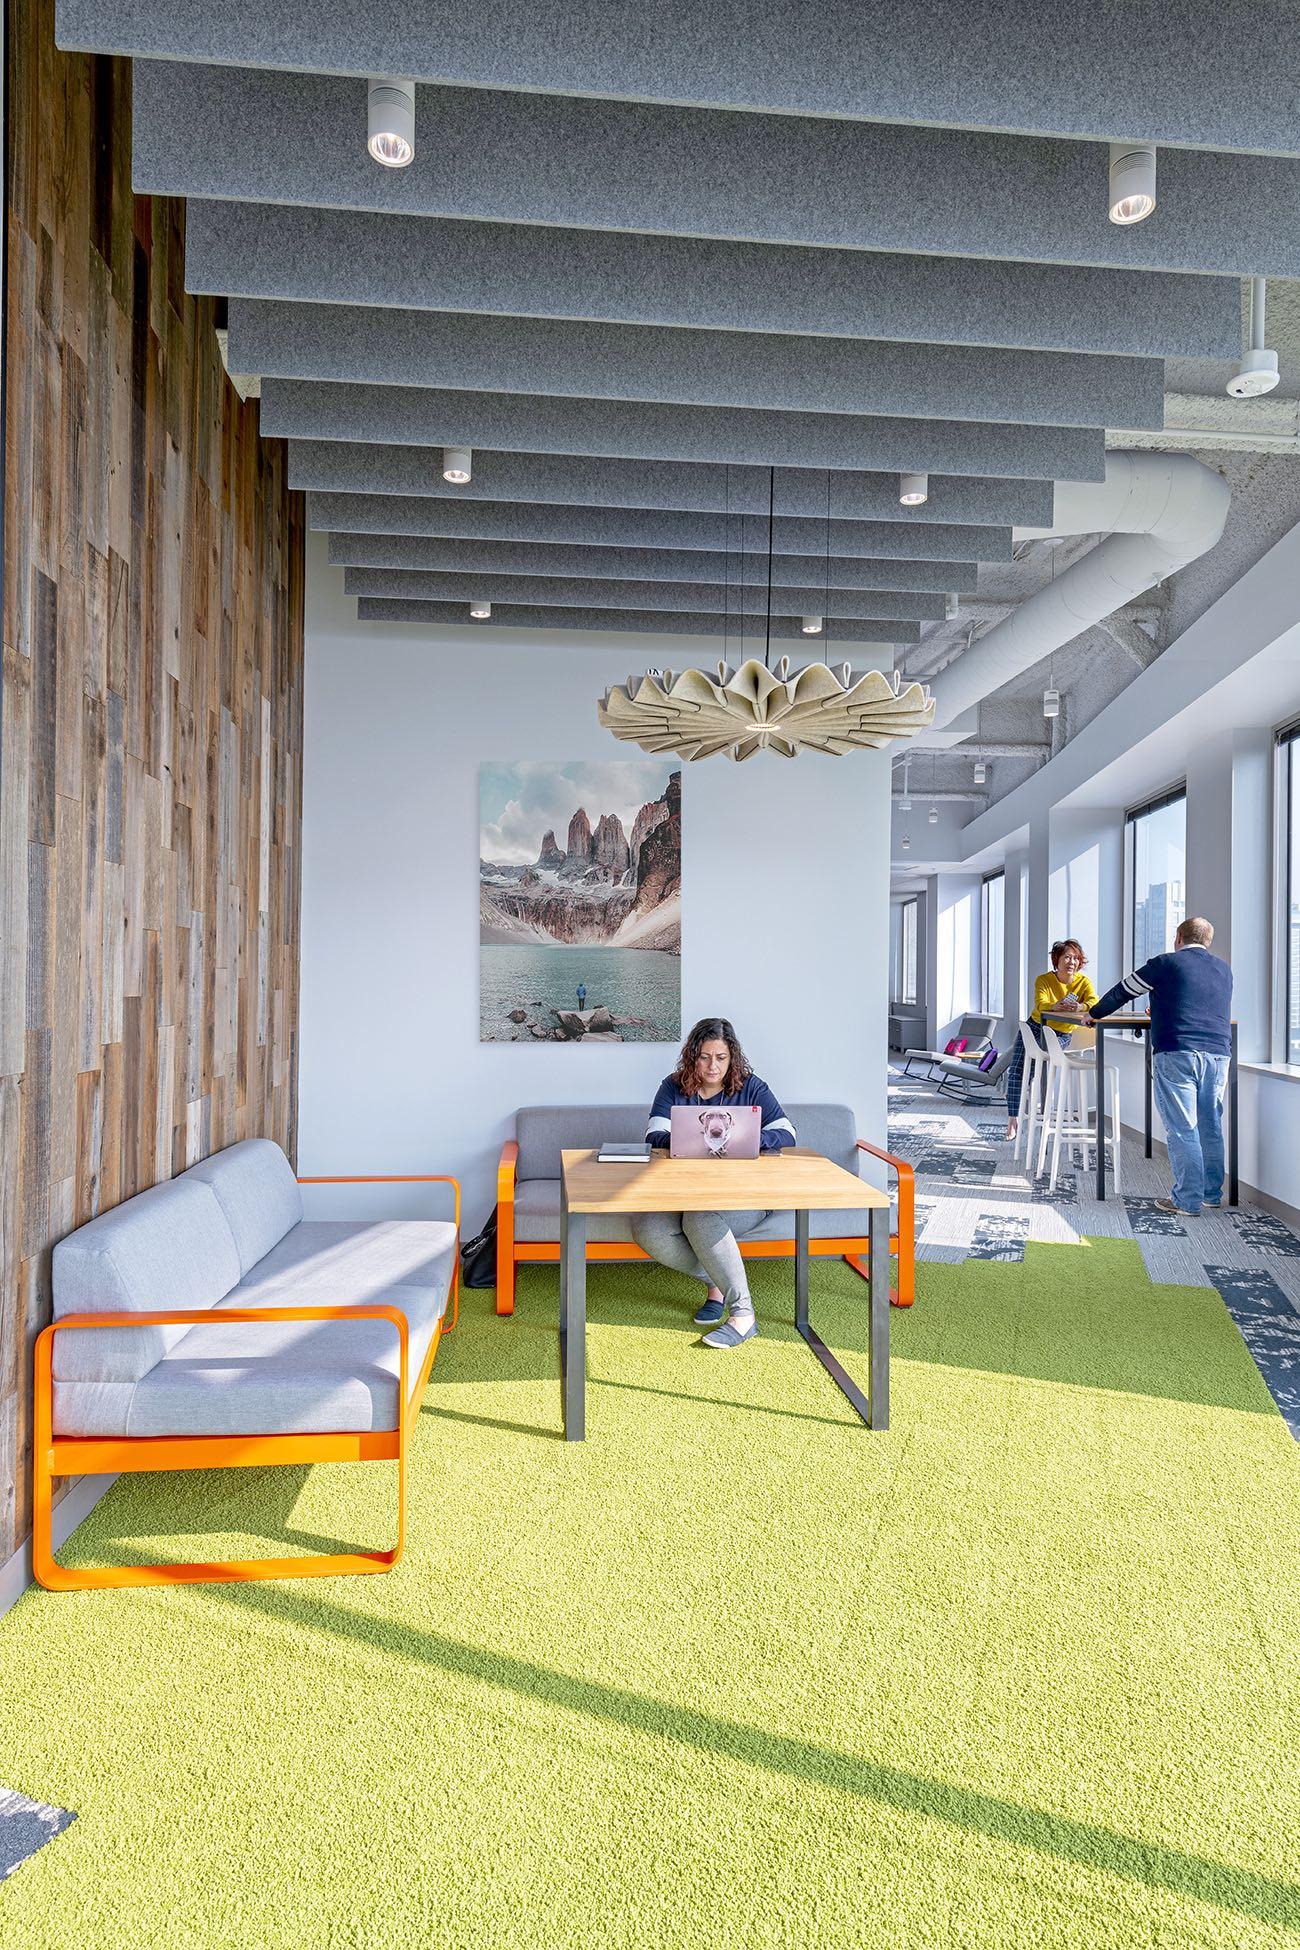 A Look Inside Adobe's Modern San Jose Headquarters